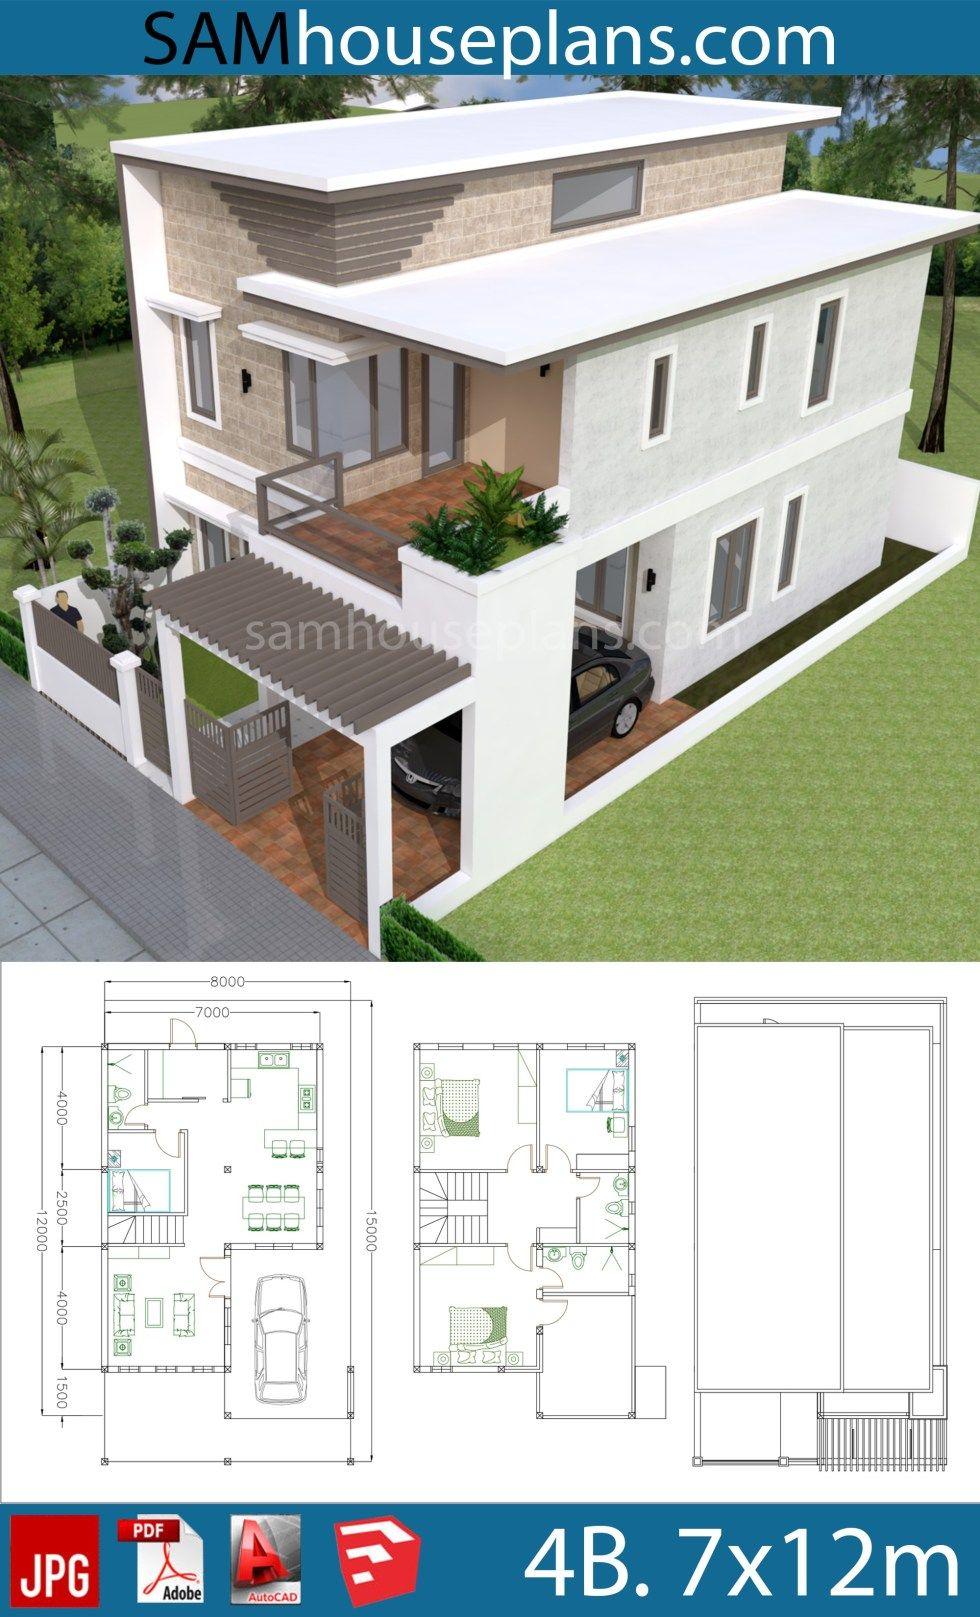 House Plans 7x12m With 4 Bedrooms Plot 8x15 Casas Con Balcon